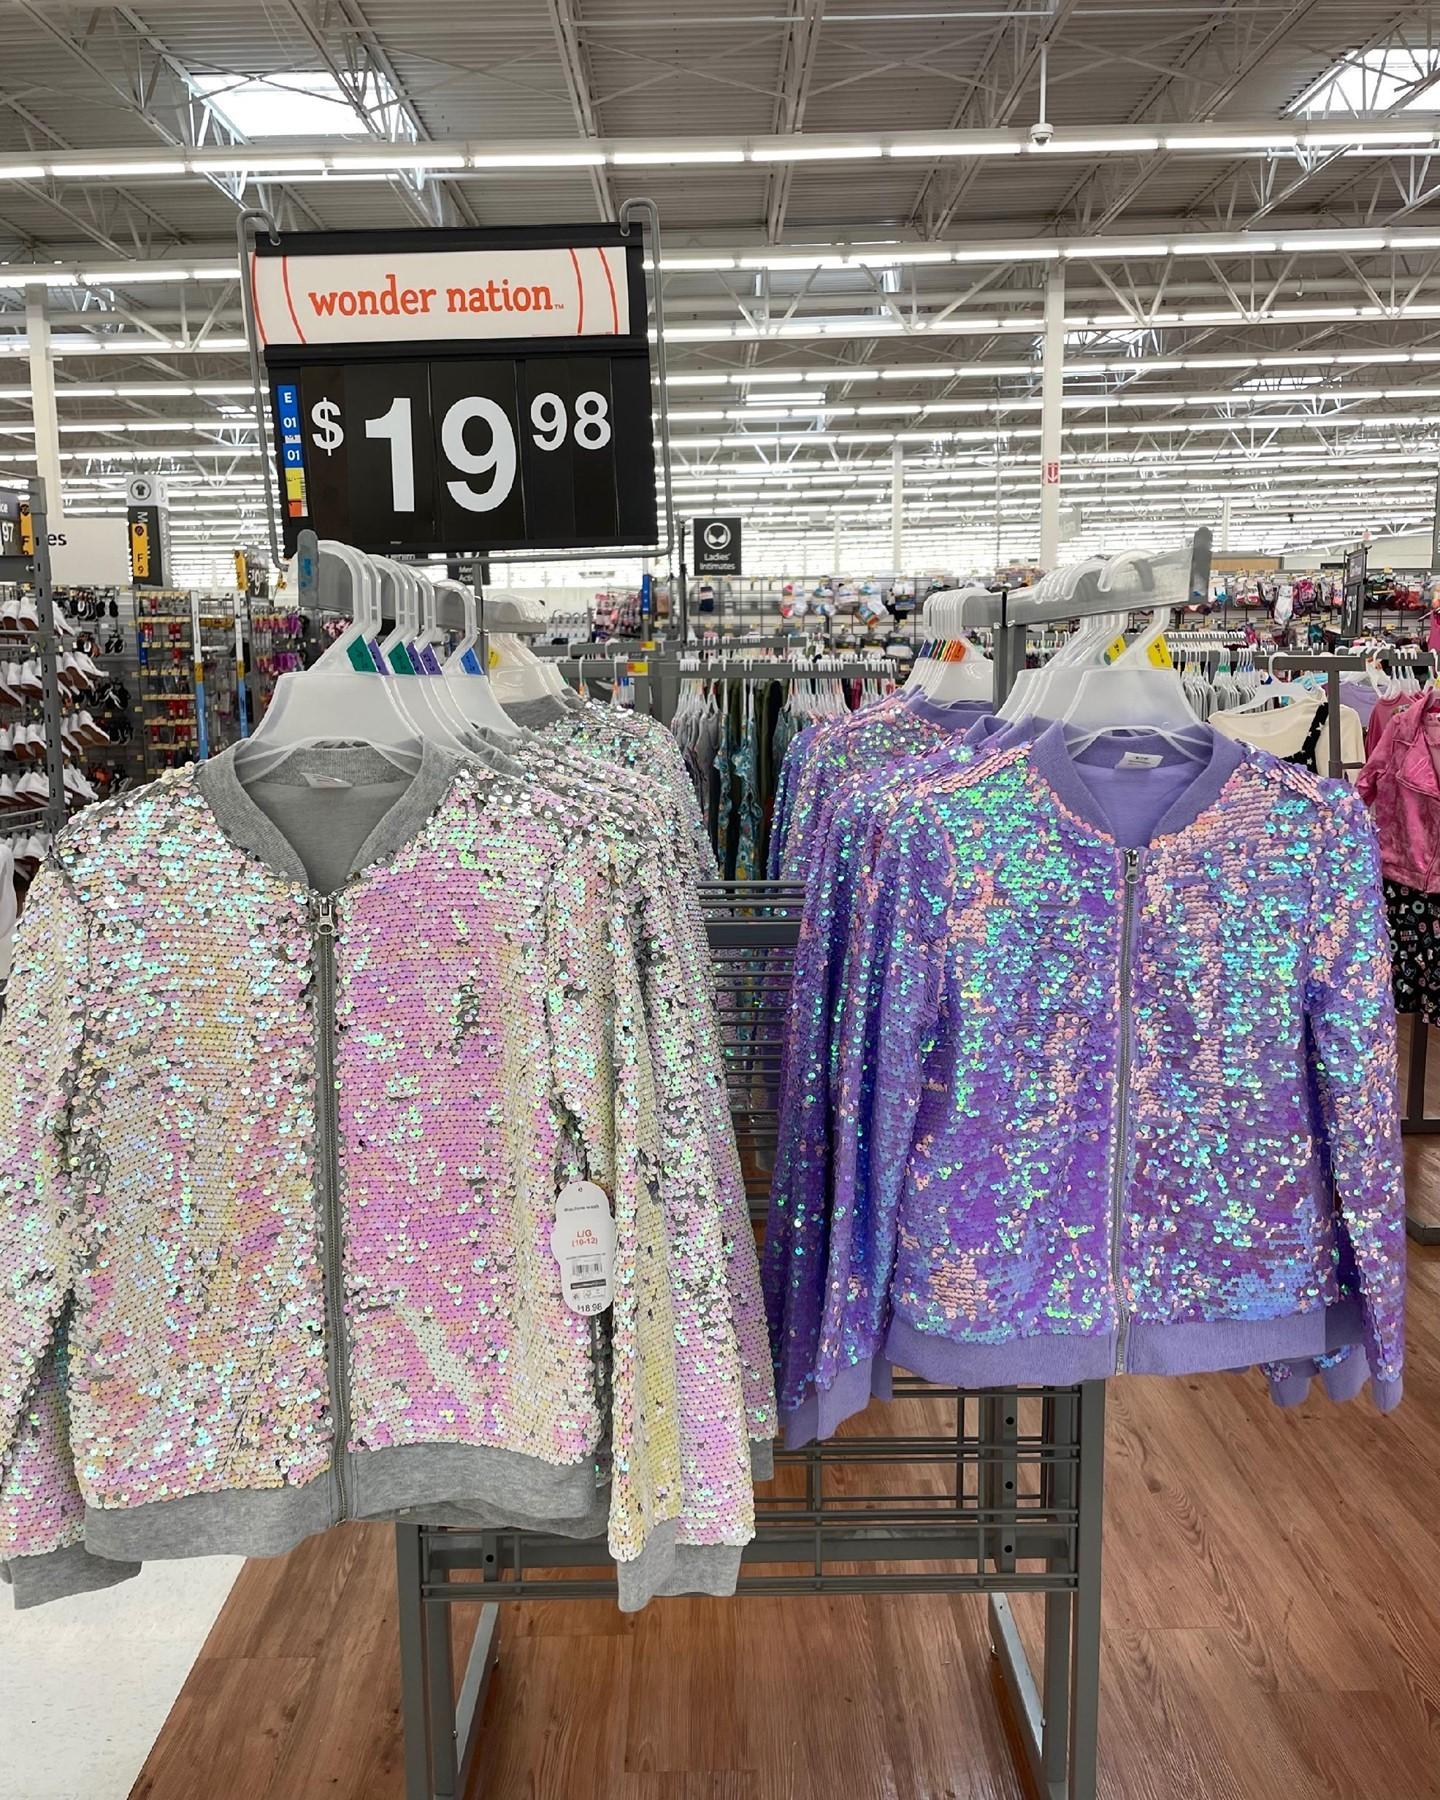 Iridescent Sequins Jacket by Wonder Nation